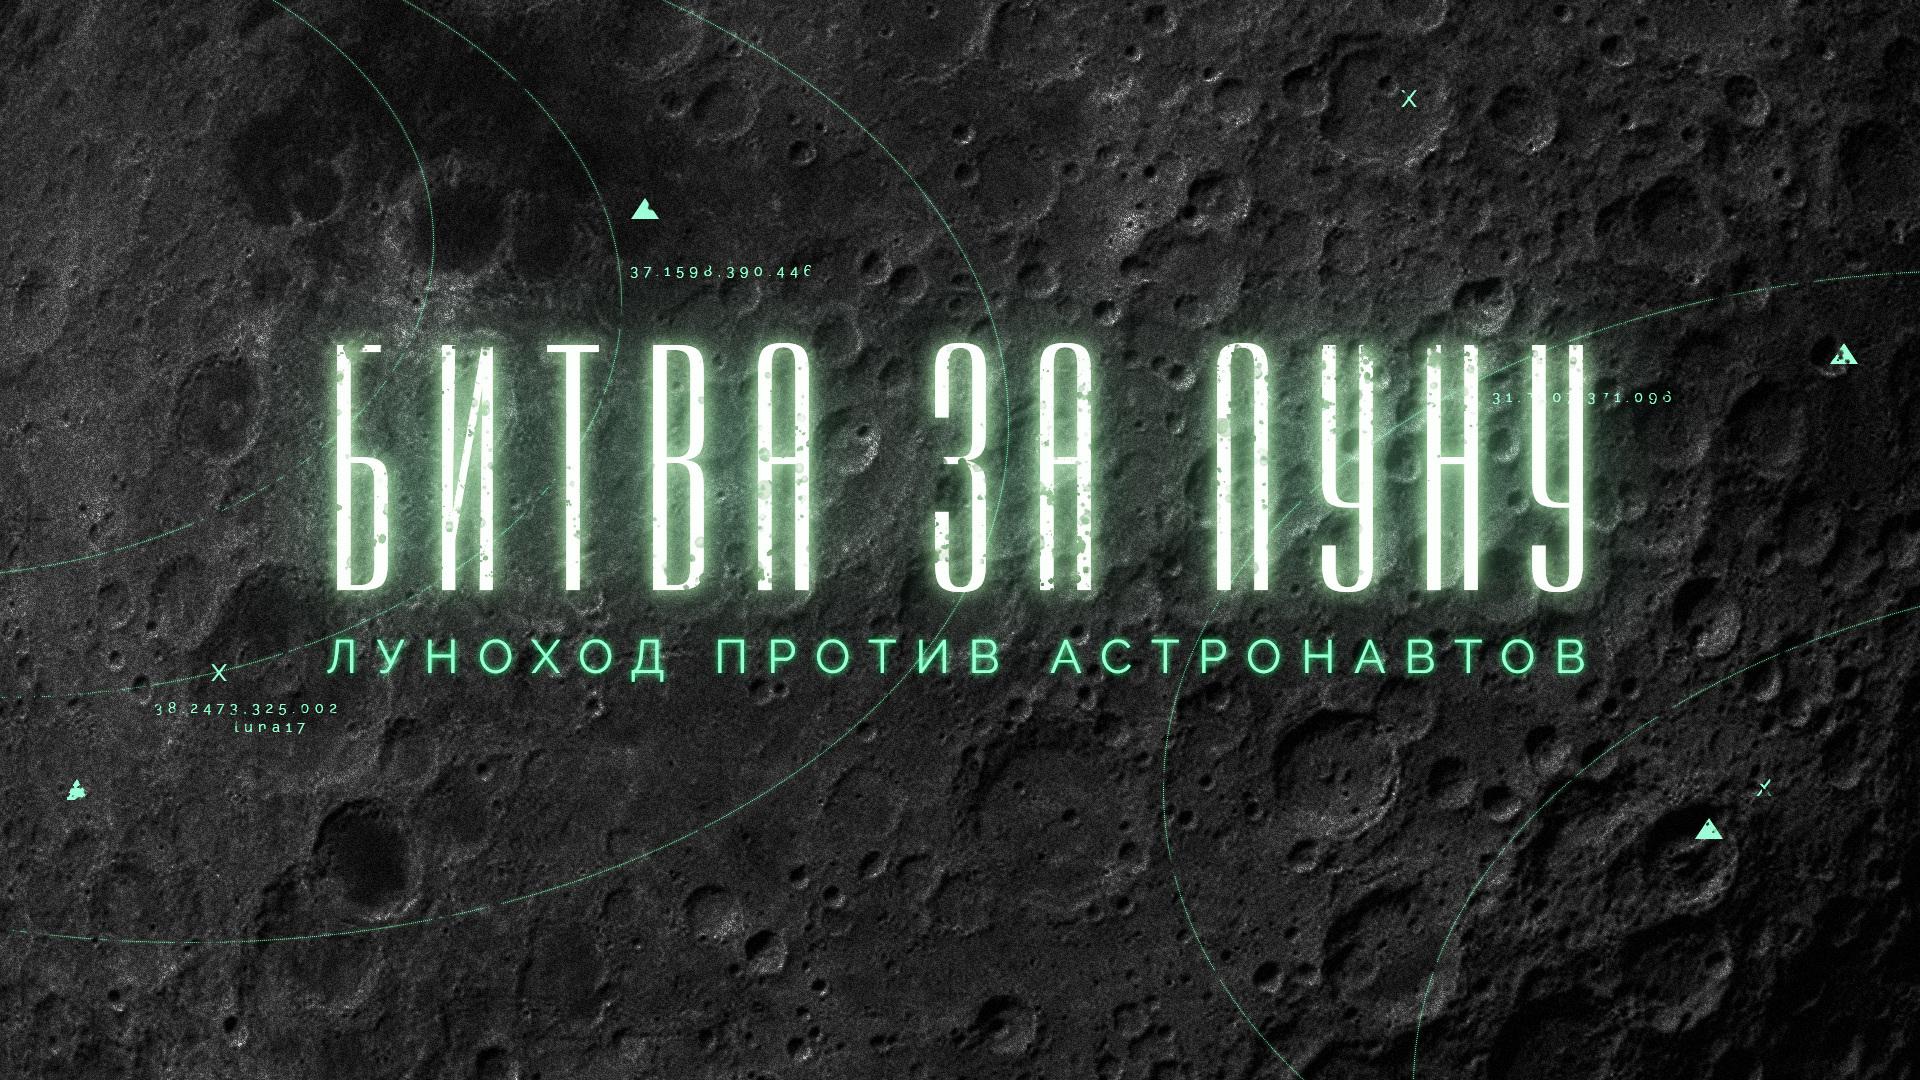 Битва за Луну. Луноход против астронавтов